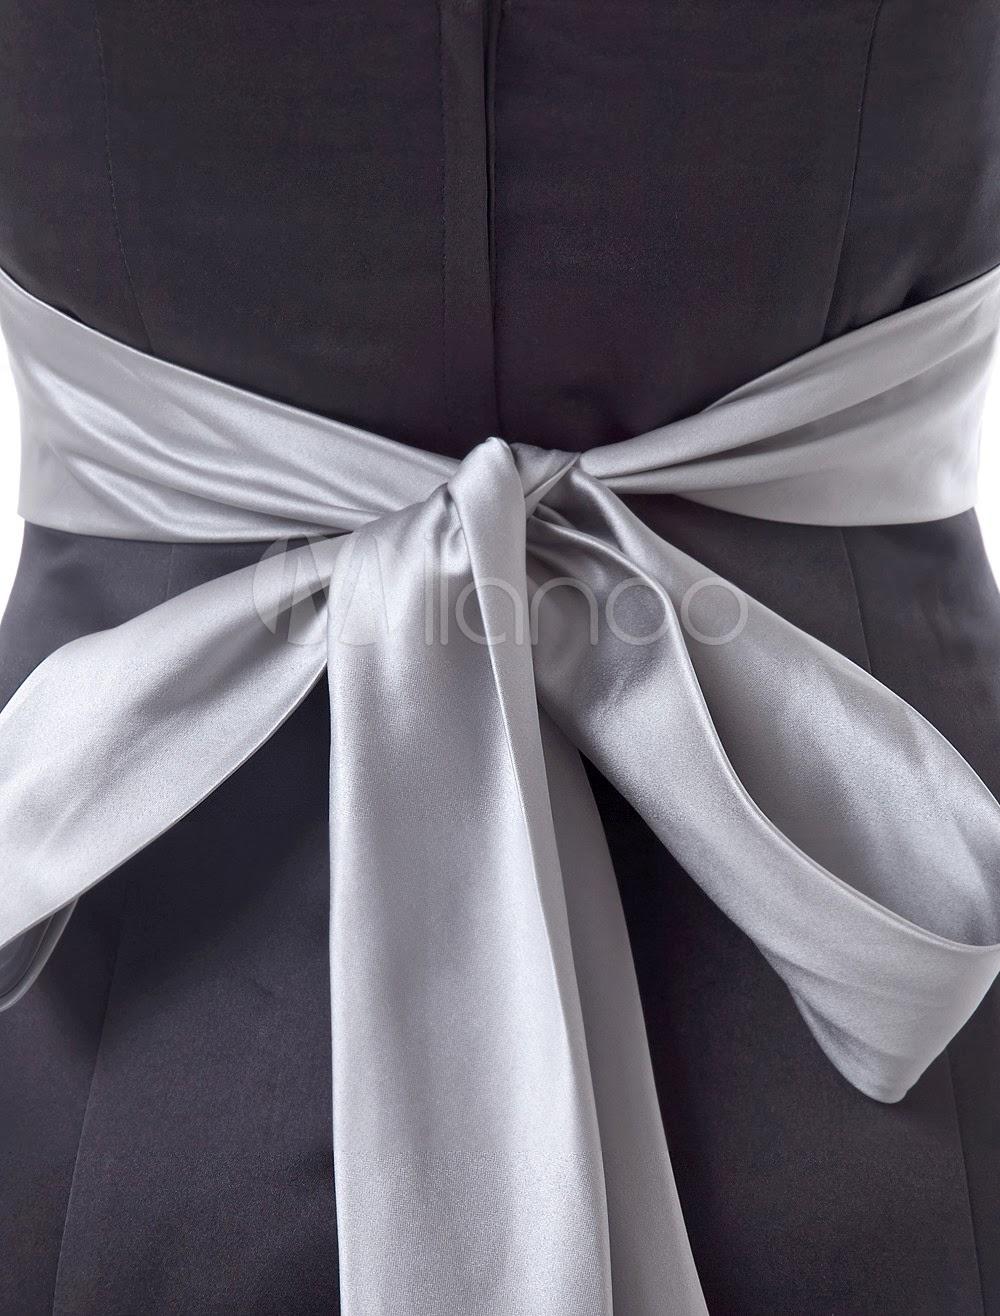 China Wholesale Dresses - Black Strapless Sweetheart Sash Floor Length Satin Bridesmaid Dress